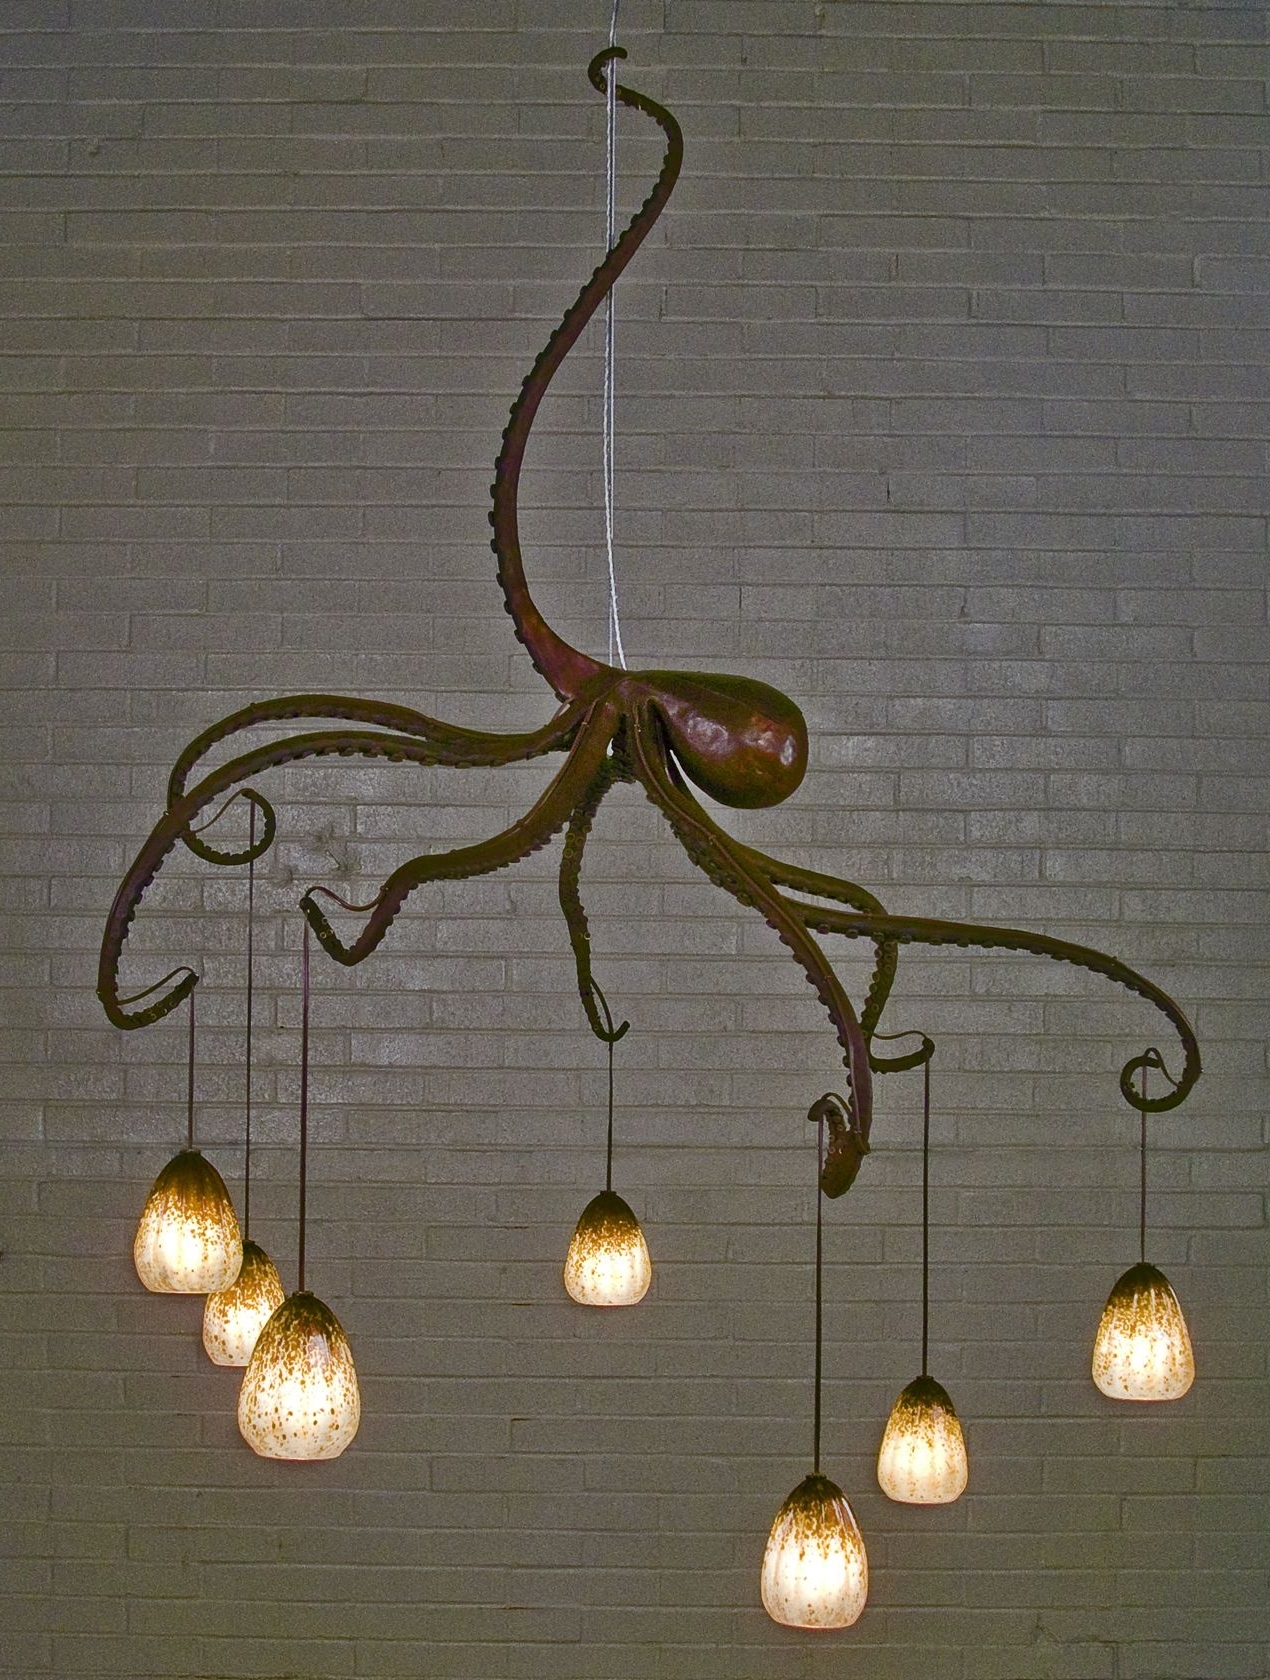 Chandelier For Restaurant Pertaining To Newest Octopus Chandelier Made For Michael Chiarello's Restaurant, Bottega (View 15 of 20)